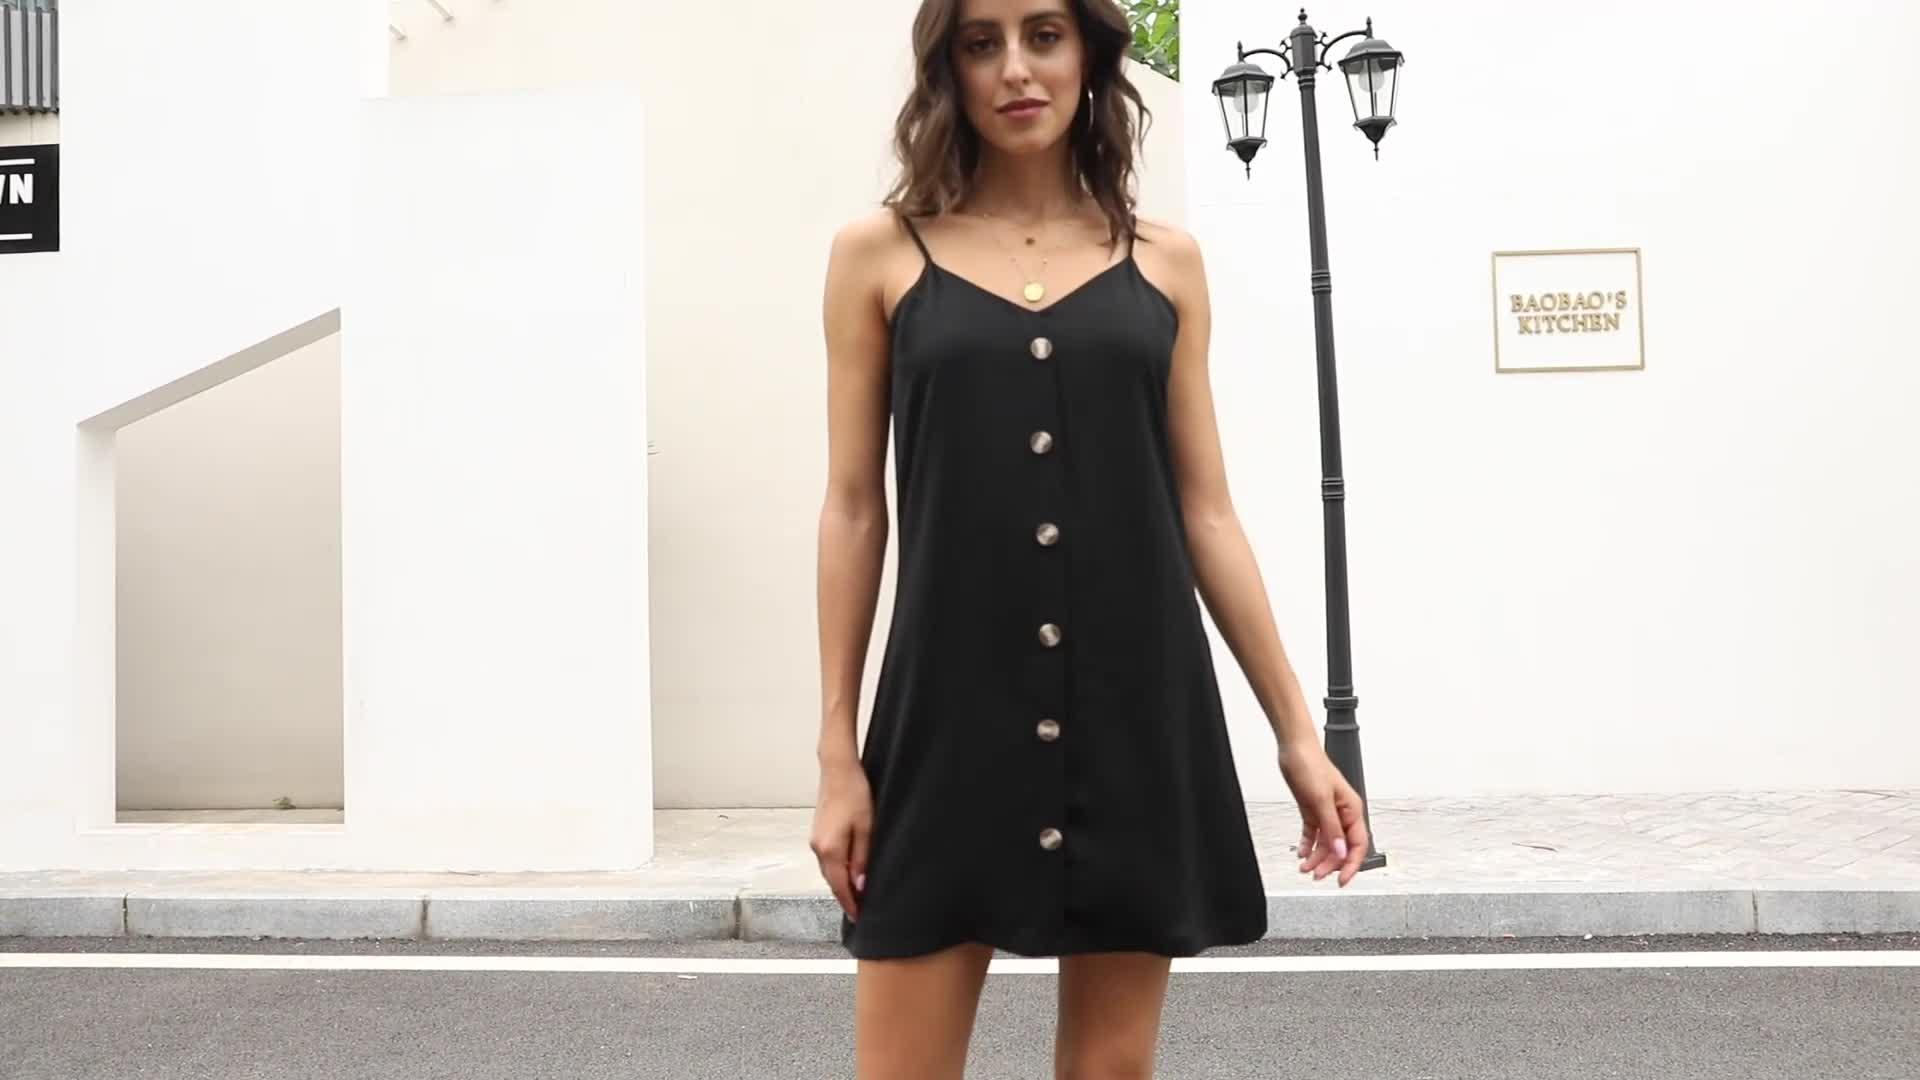 Secrets Tips Of A Fashion Women To Look Hot – Follow Fashion Advice!